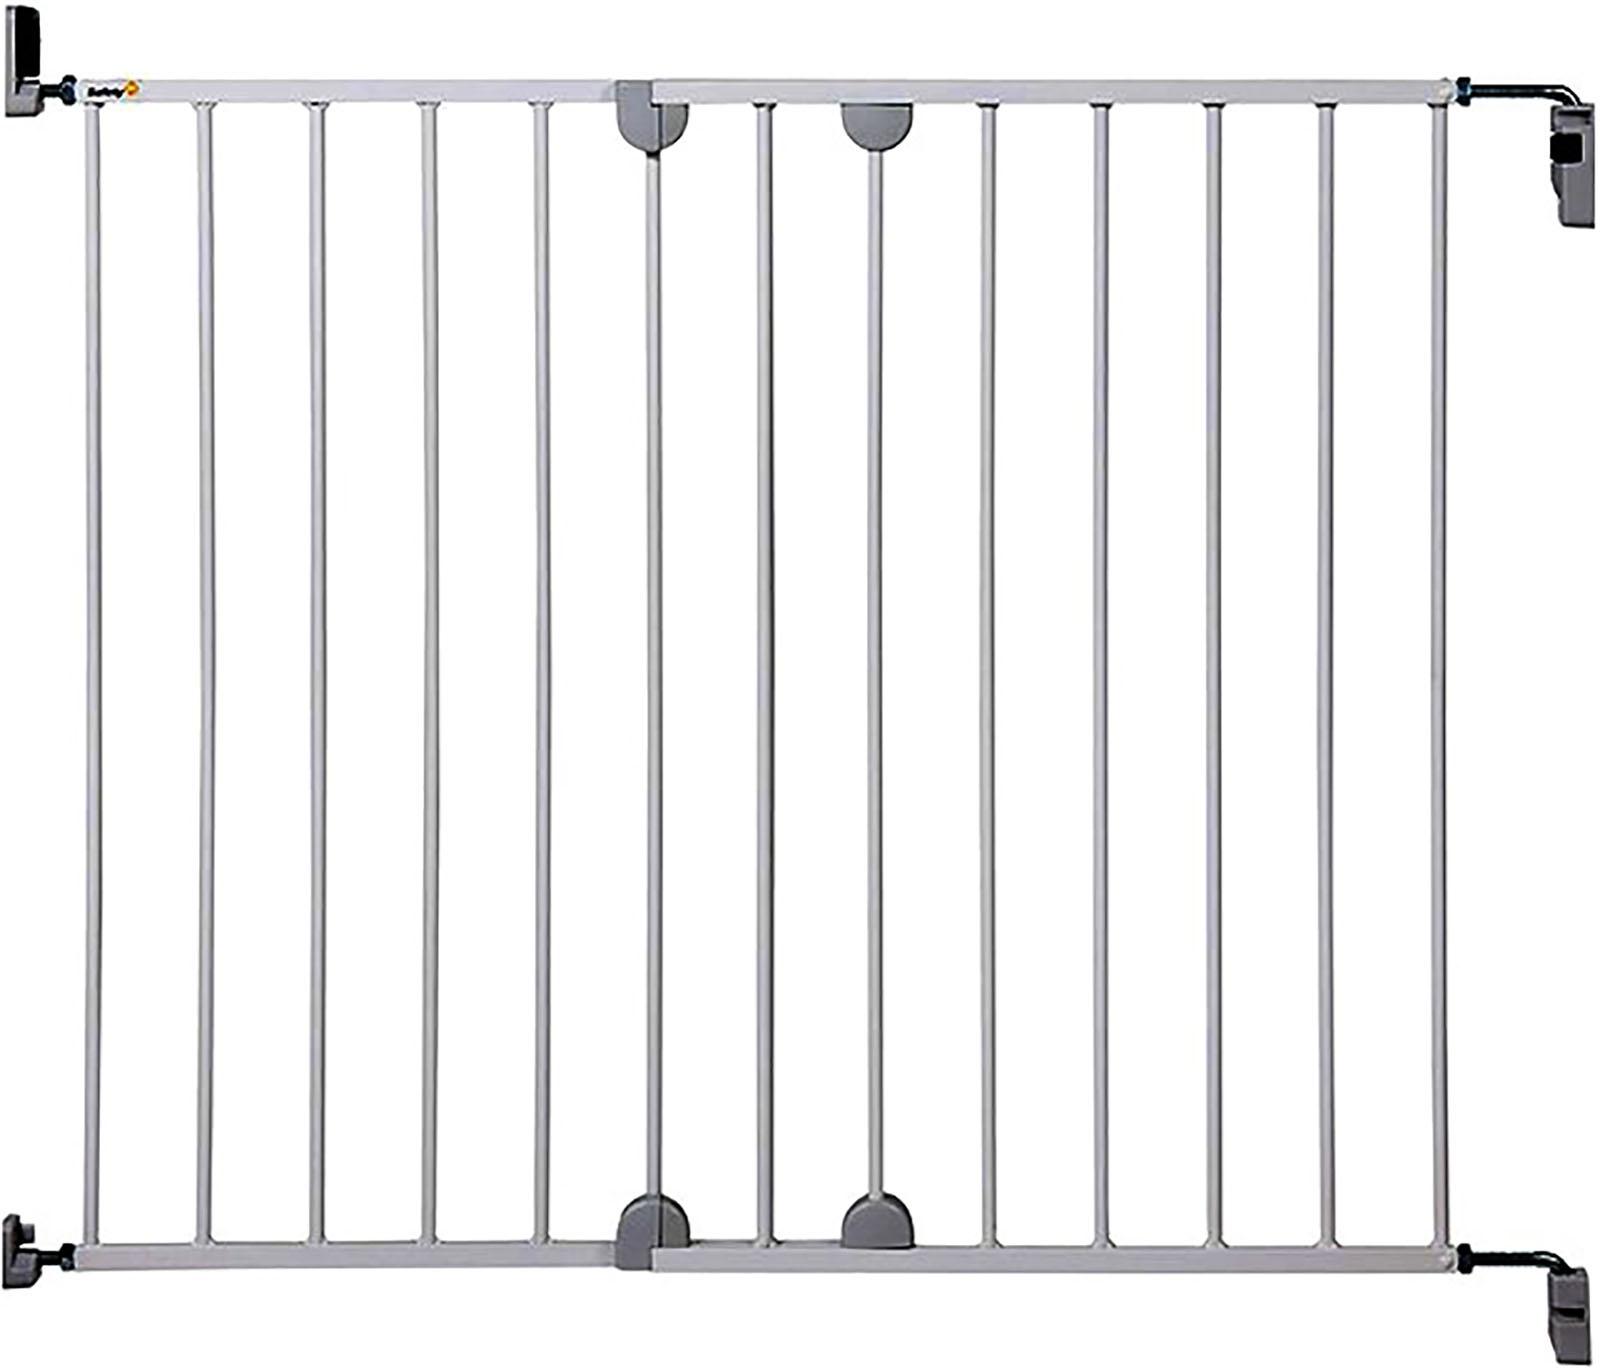 Барьер Safety 1st Wall-Fix Extending Metal, 62-102 см белый барьер safety 1st барьер safety 1st 24530010 24530010 серый